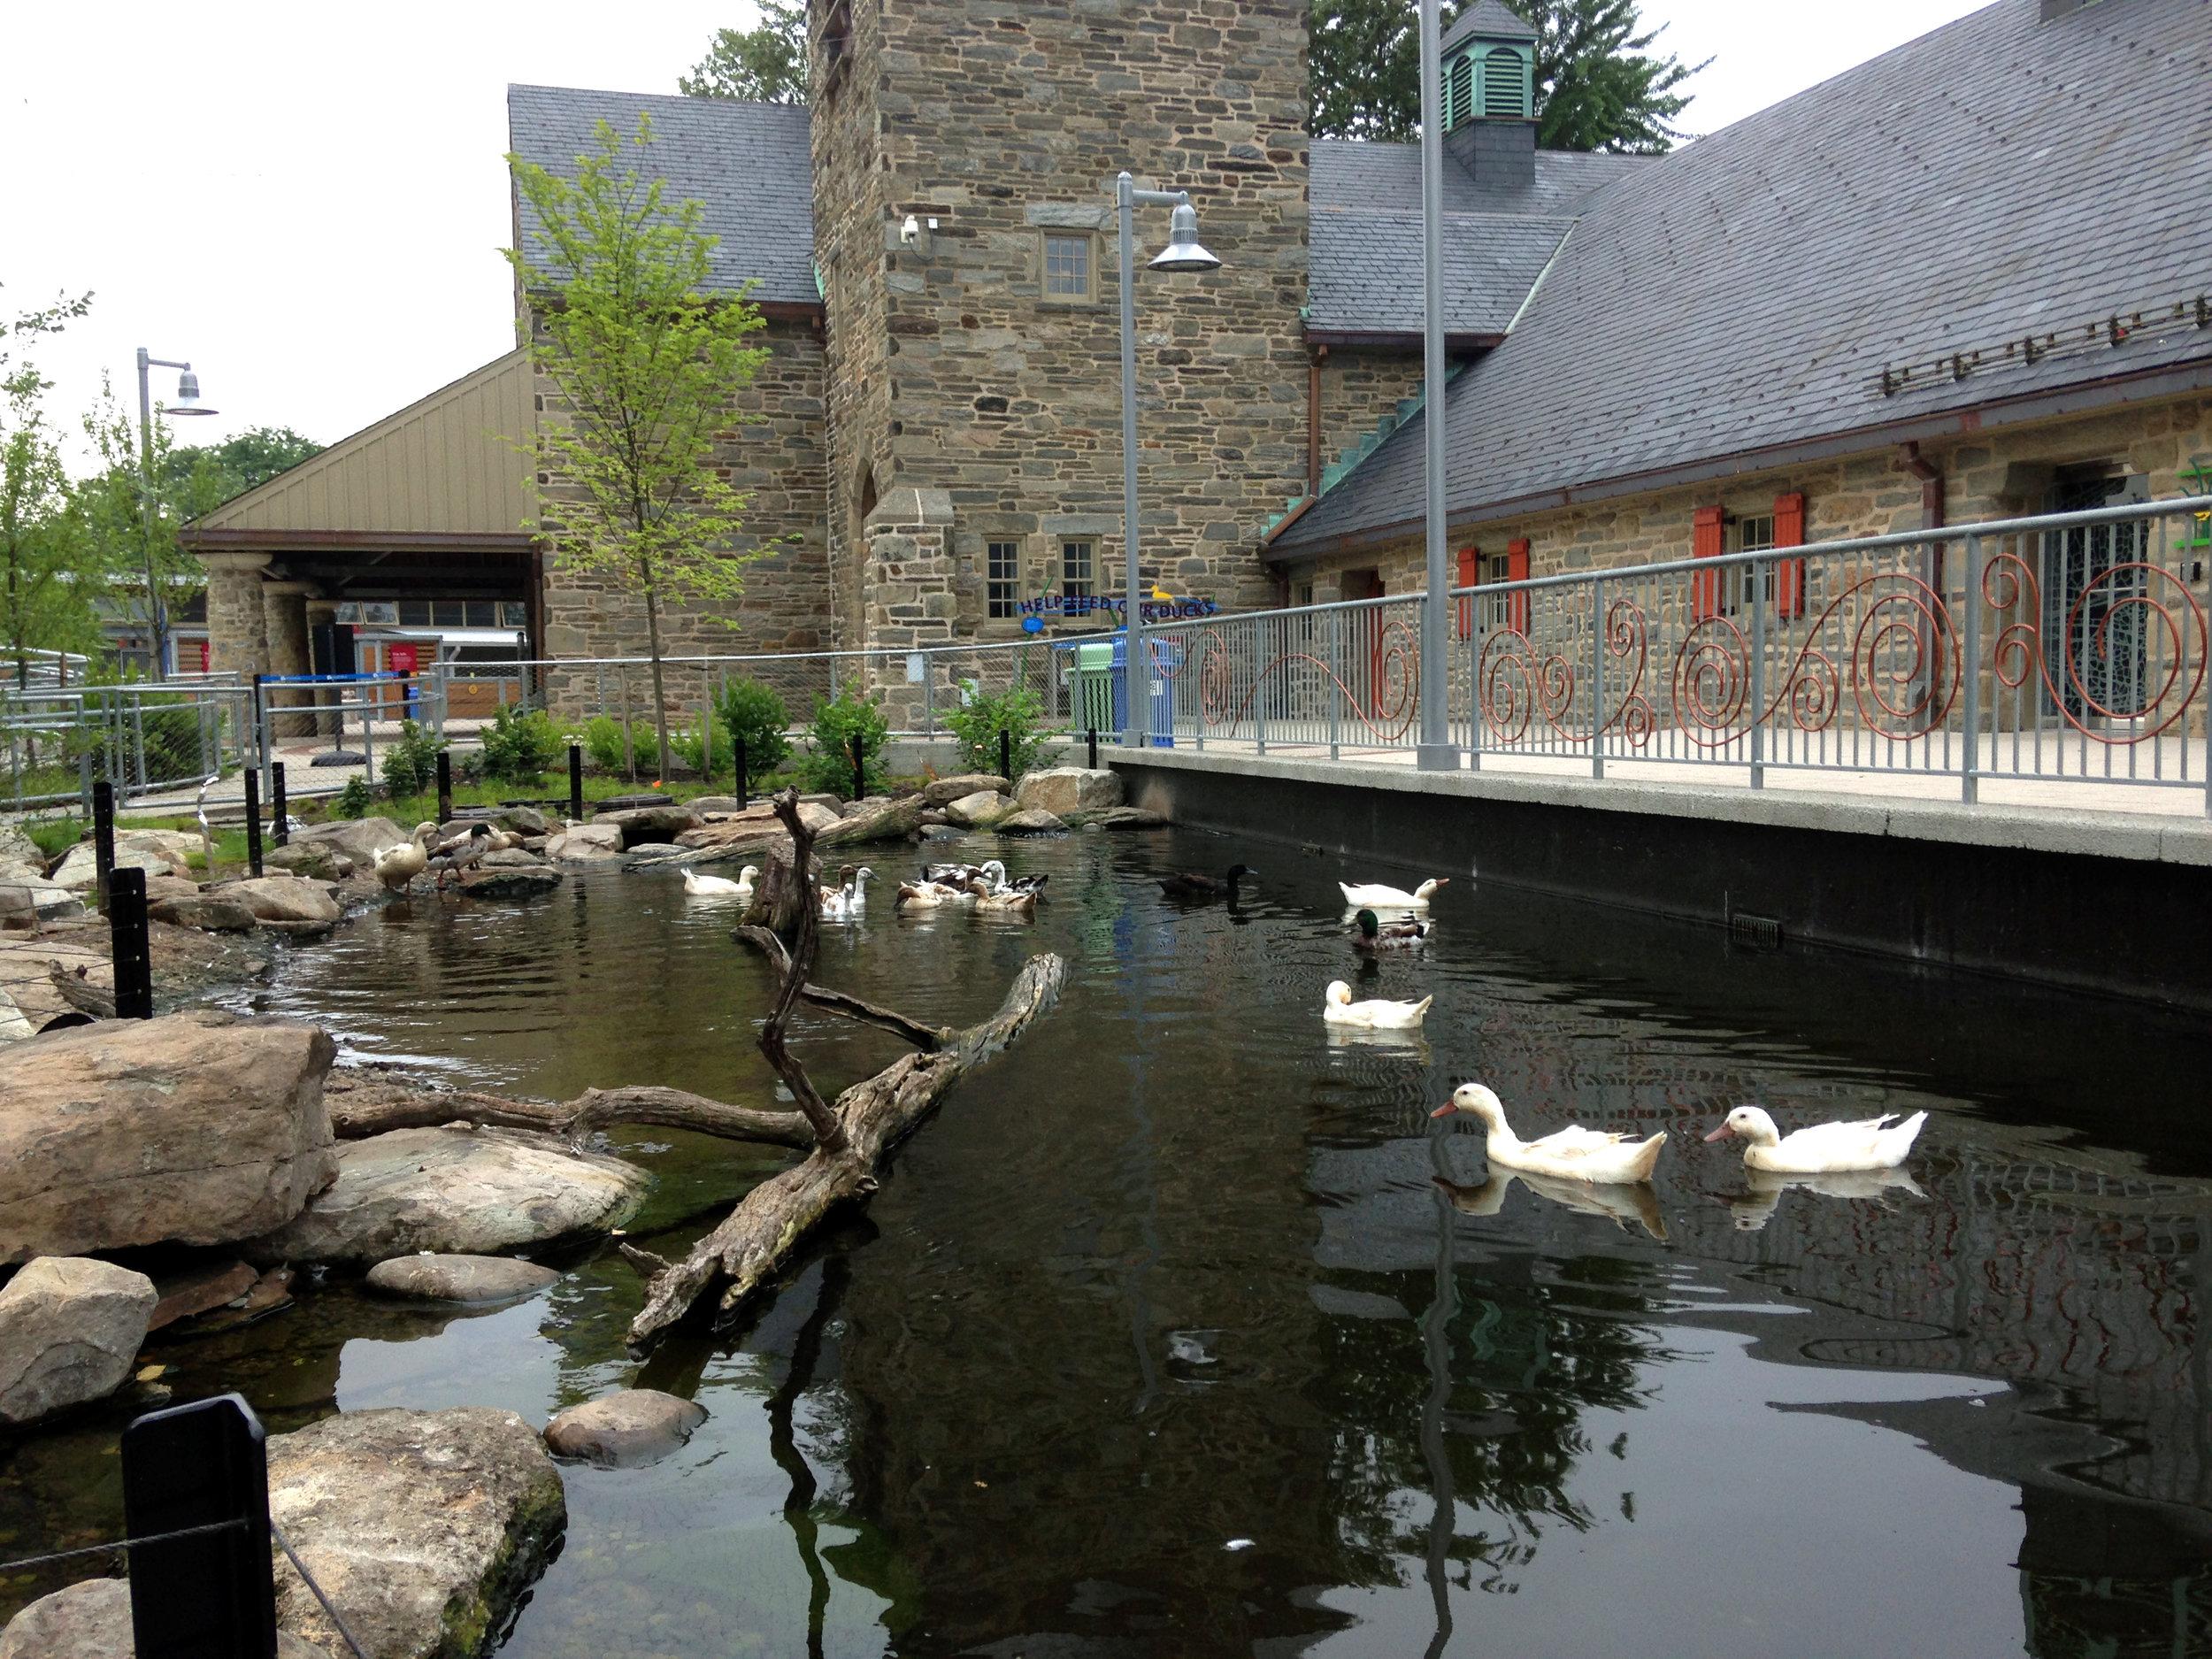 Pondworks_Philadelphia zoo_duck pond.JPG